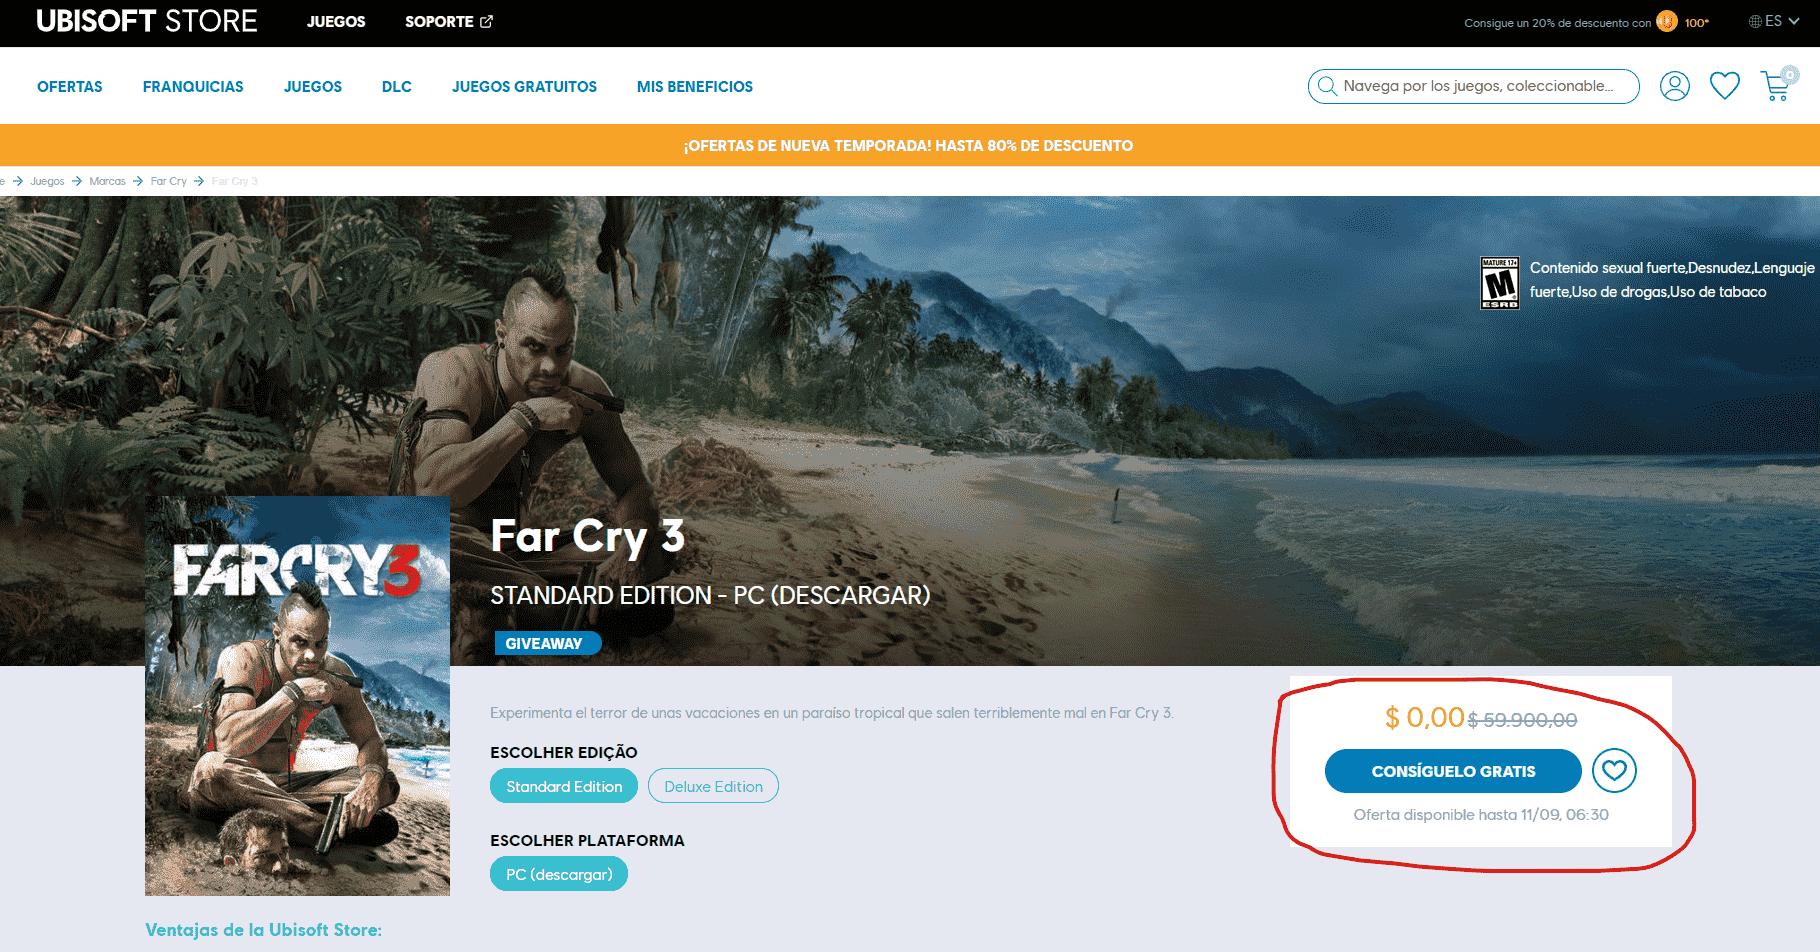 Far Cry 3 es GRATIS para PC en Ubisoft Connect Ver Como Descargar